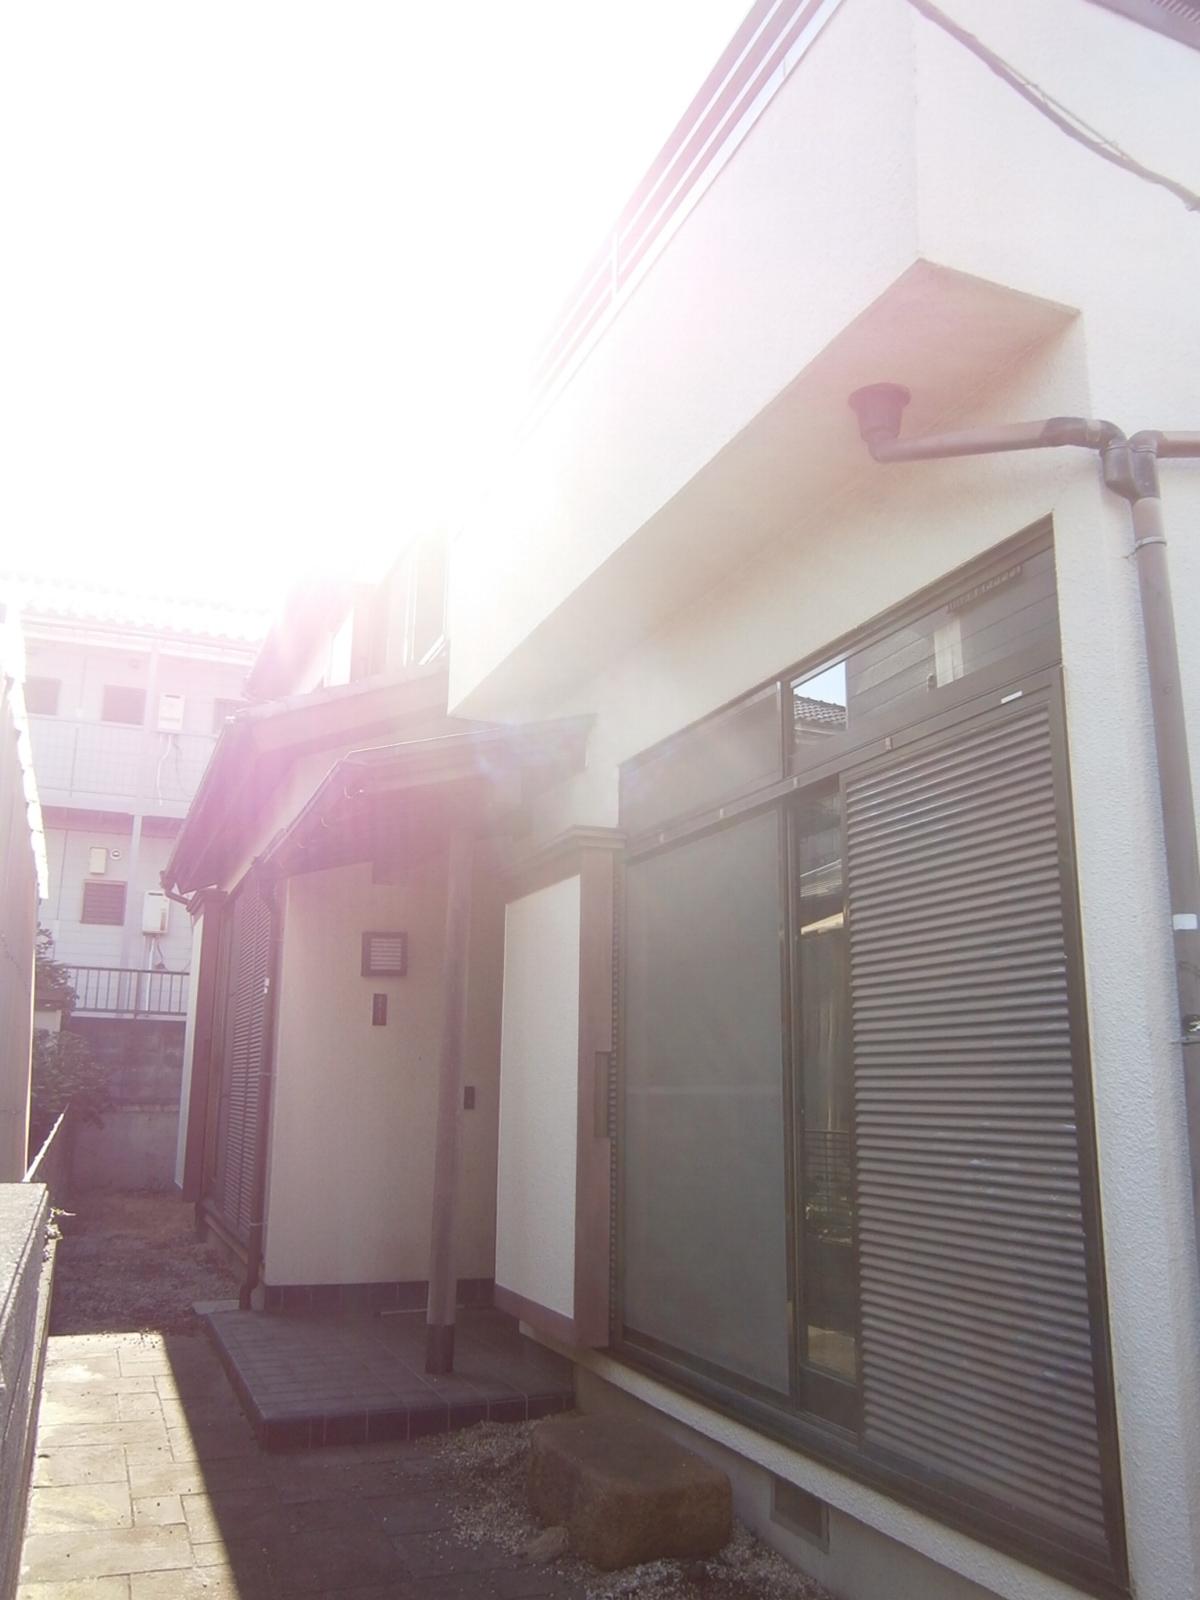 http://www.lifeplanet.jp/work/P9140015.JPG